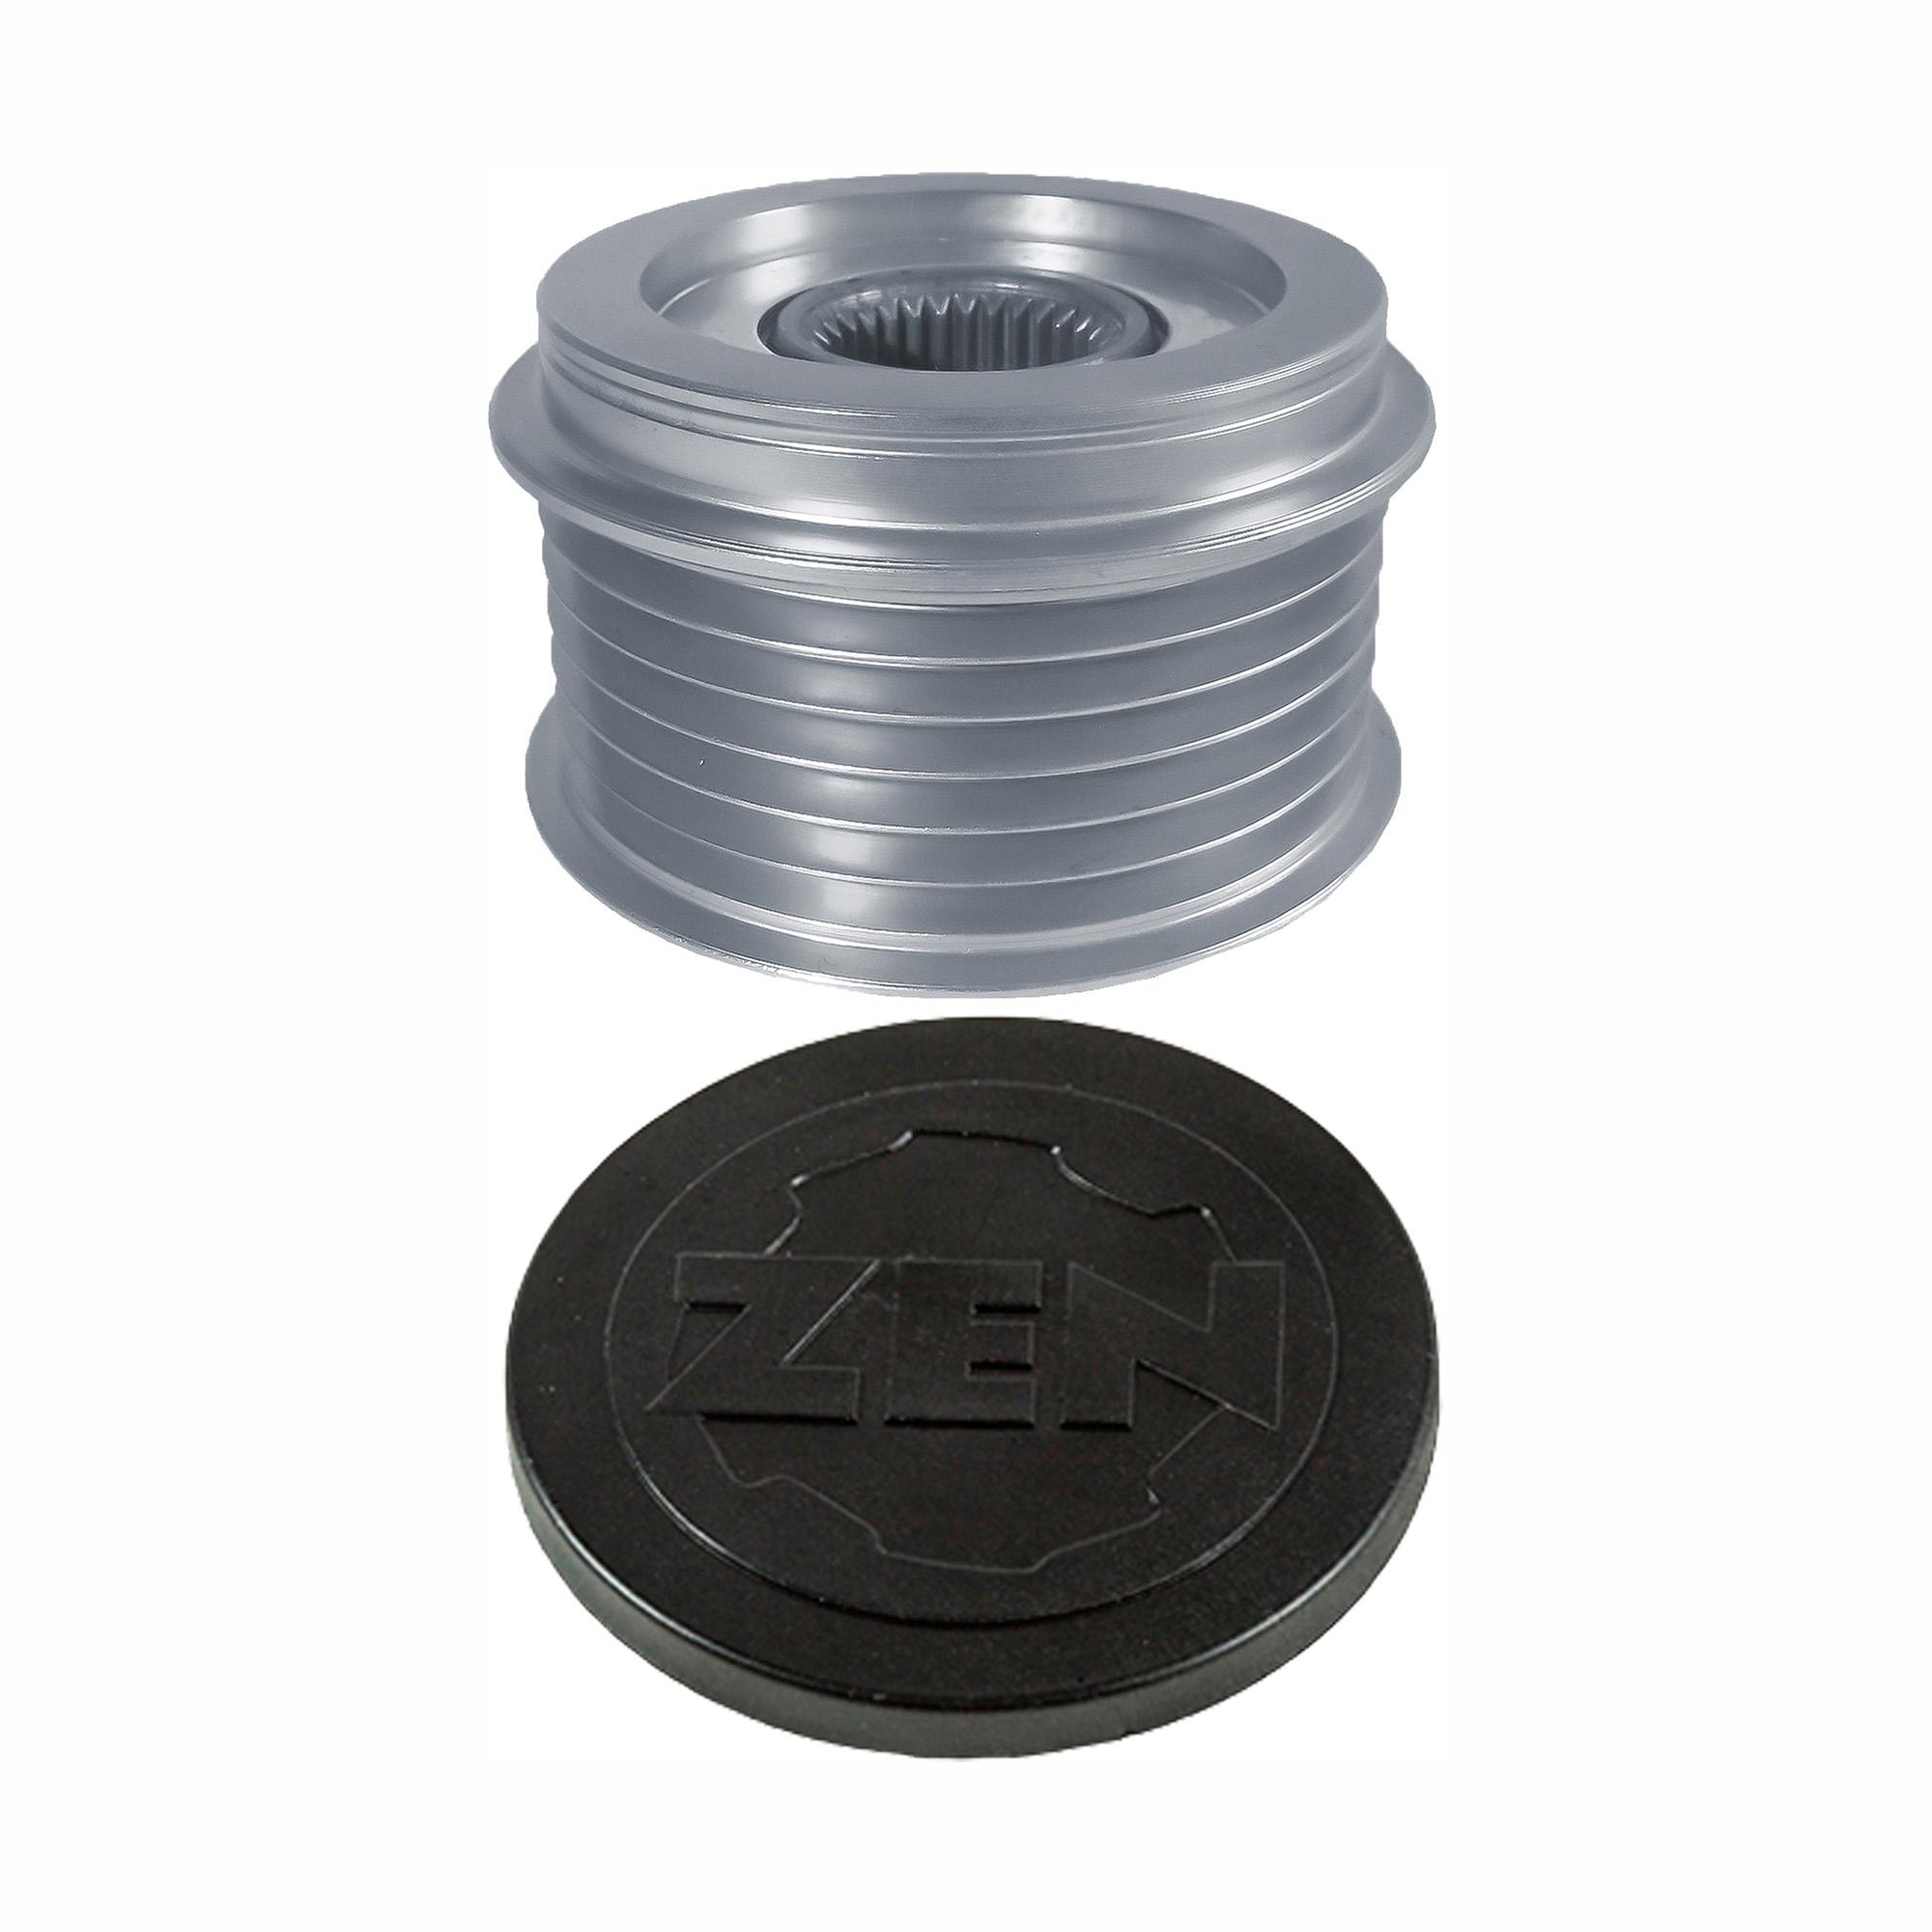 Polia Alternador Roda Livre AUDI TOUAREG (ZEN5595) - ZEN - PEÇA - SKU: 24866 A4 /A8 /A6 /TOUAREG /A5 /A7 /Q5 /Q7